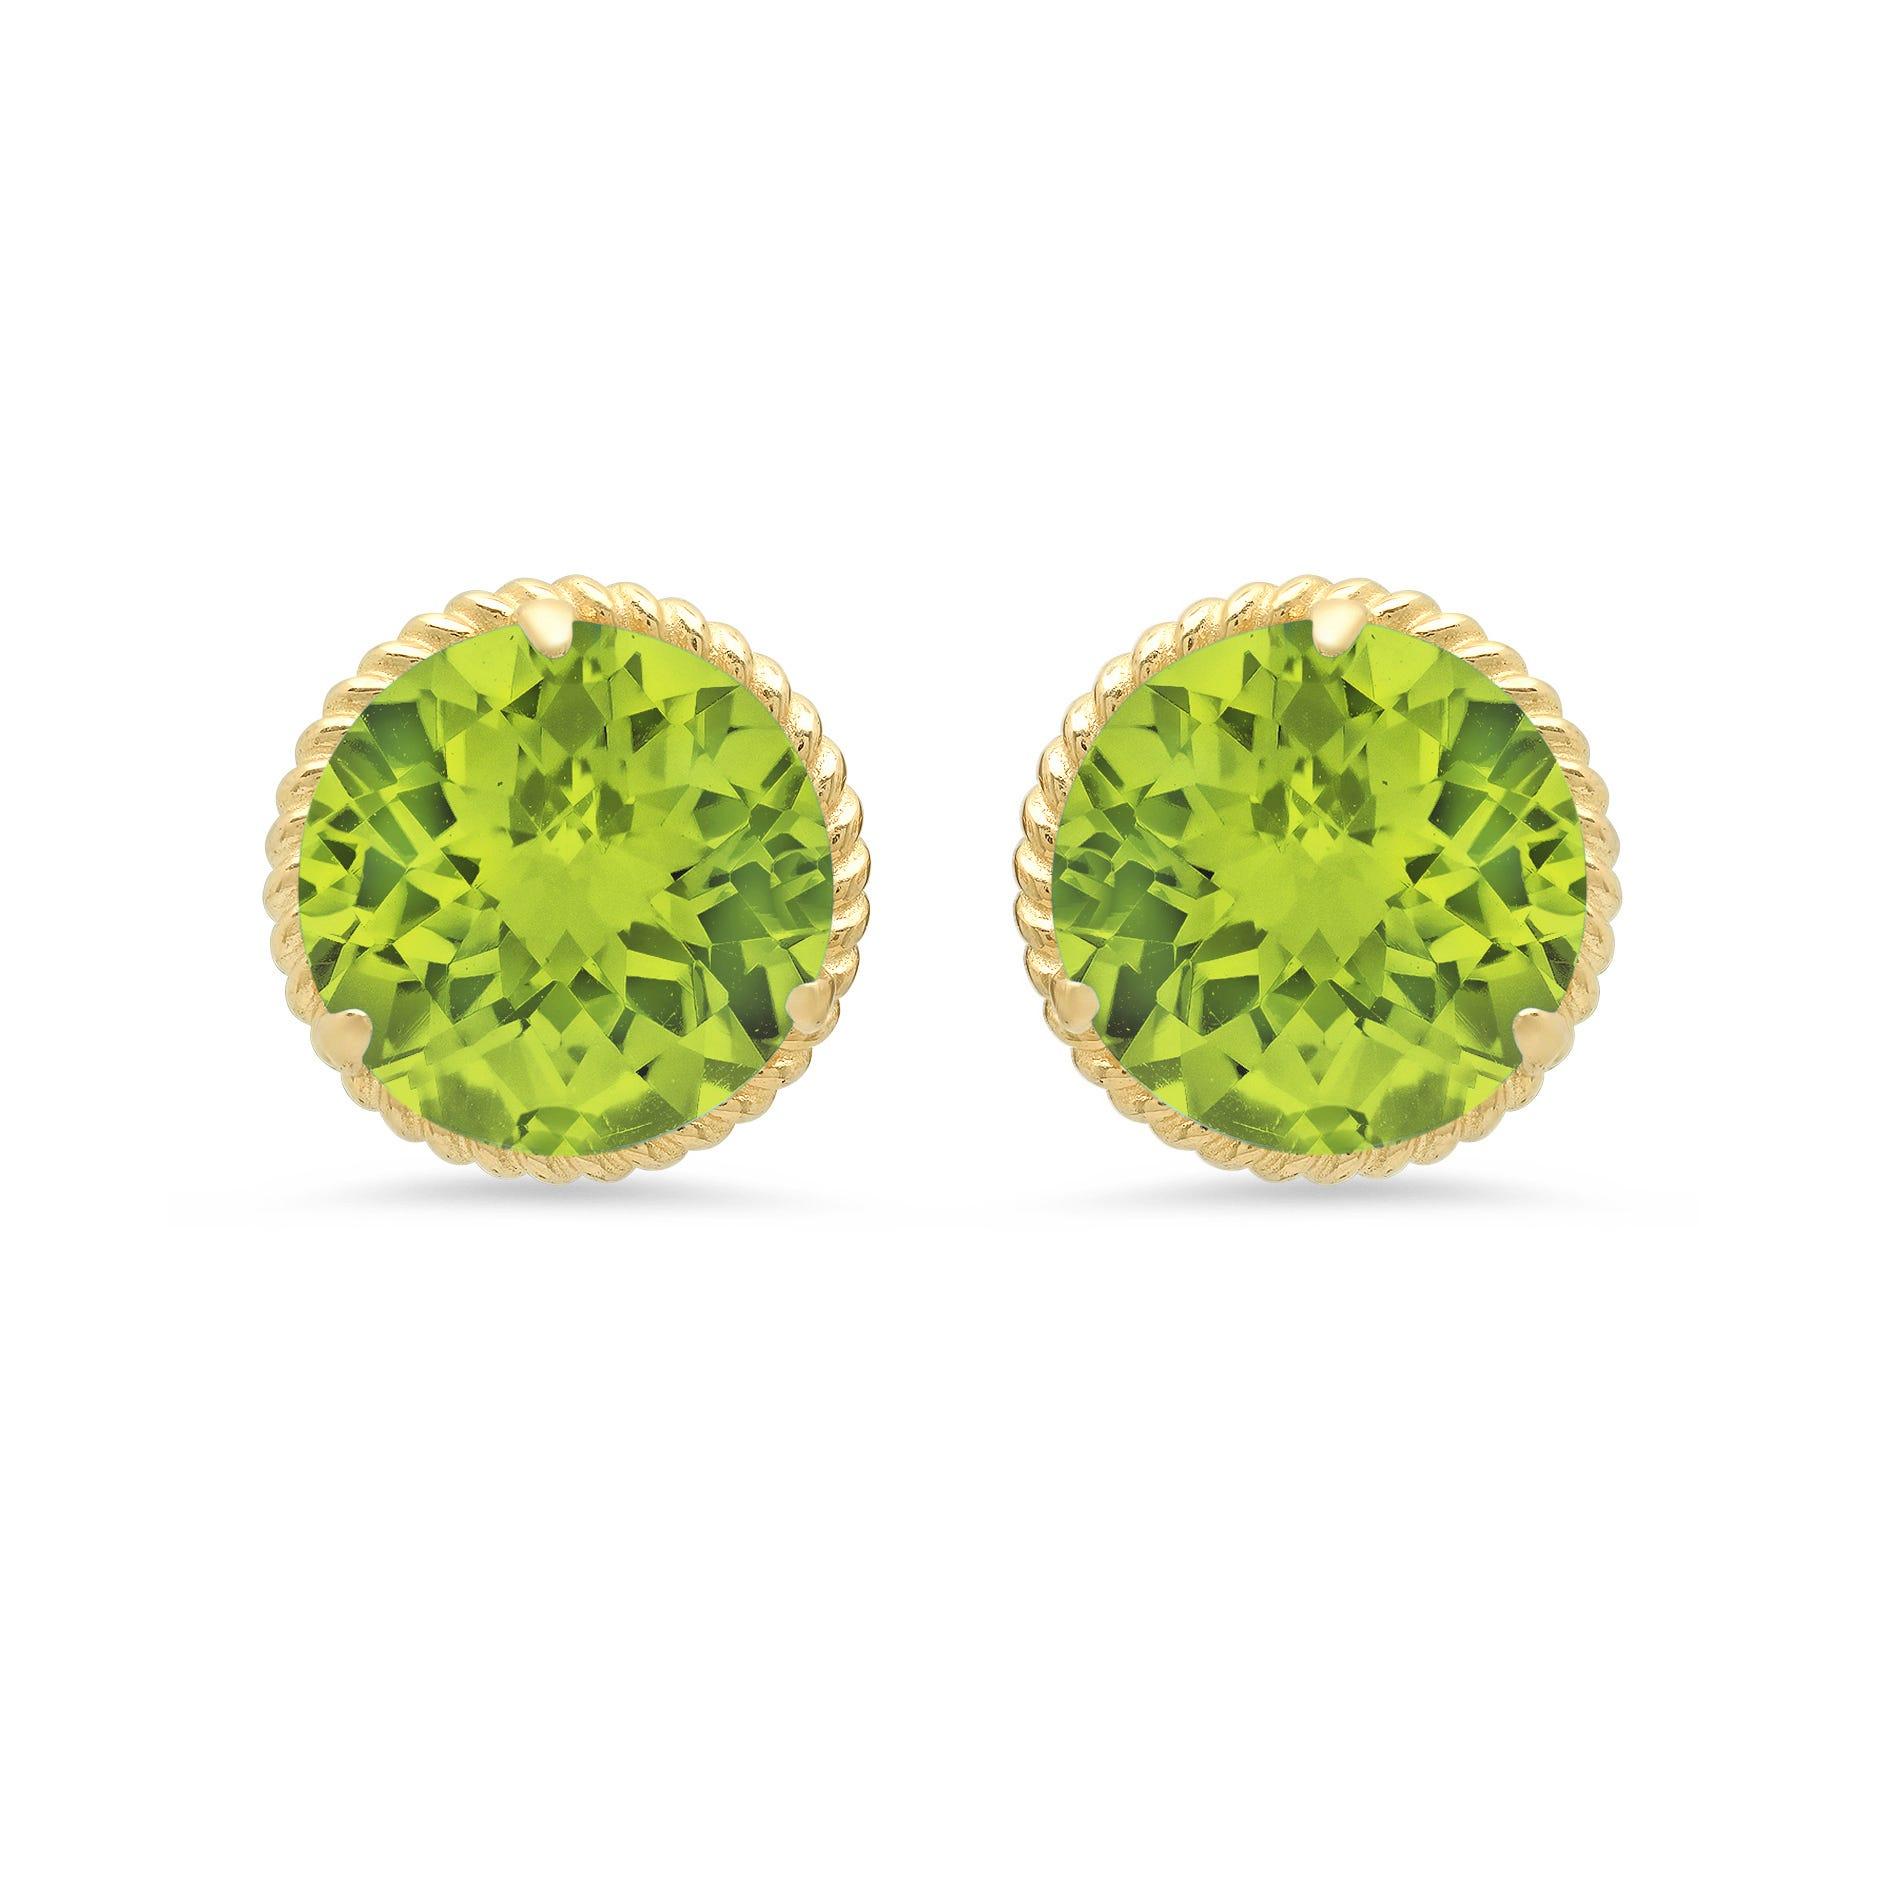 Peridot Roped Halo Stud Earrings in 14k Yellow Gold